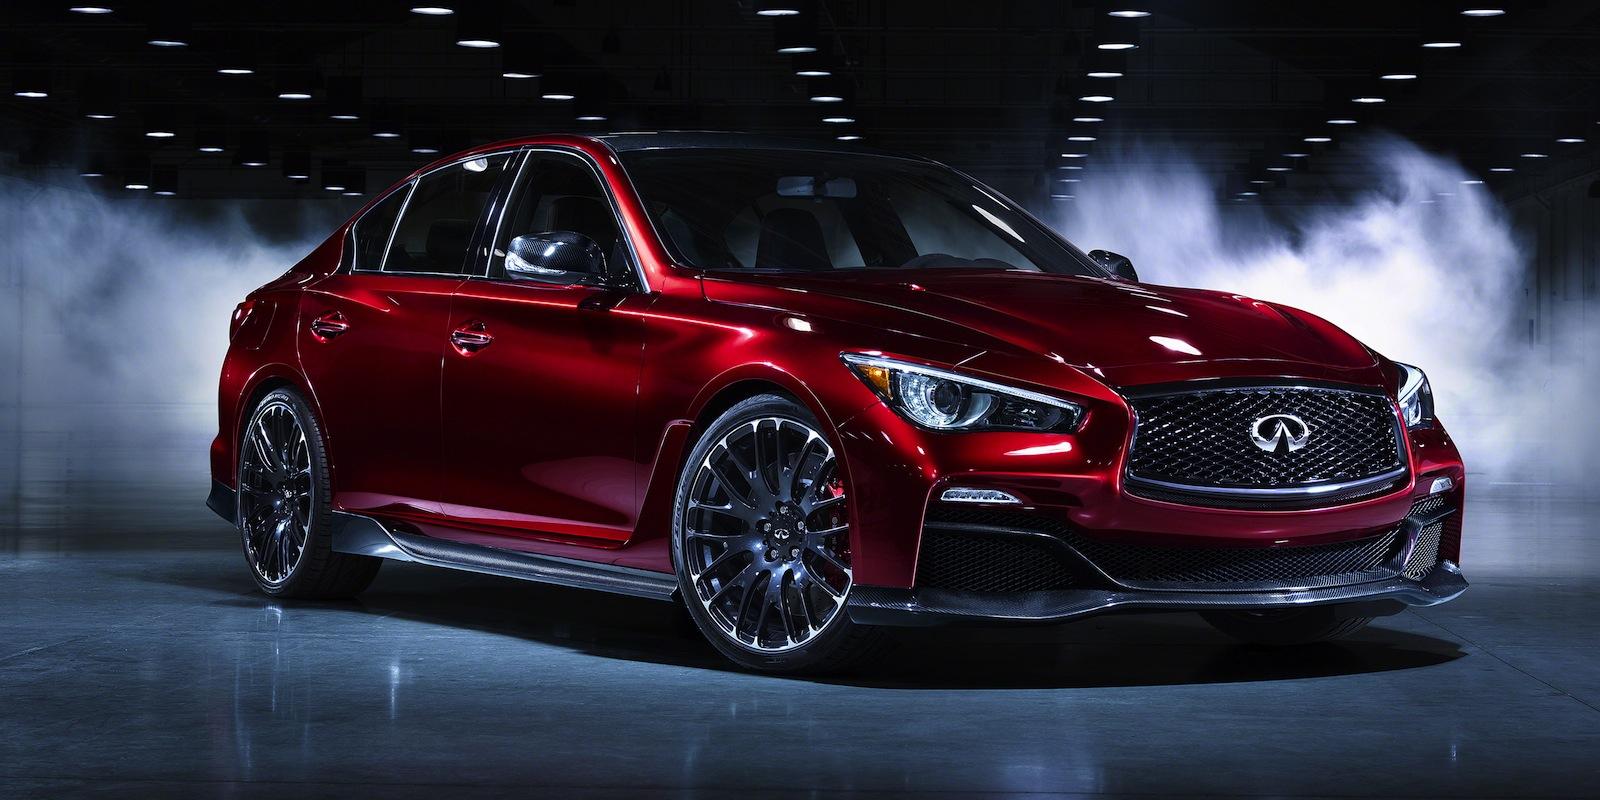 Infiniti q50 eau rouge concept teases potential 372kw 812nm sports sedan photos 1 of 16